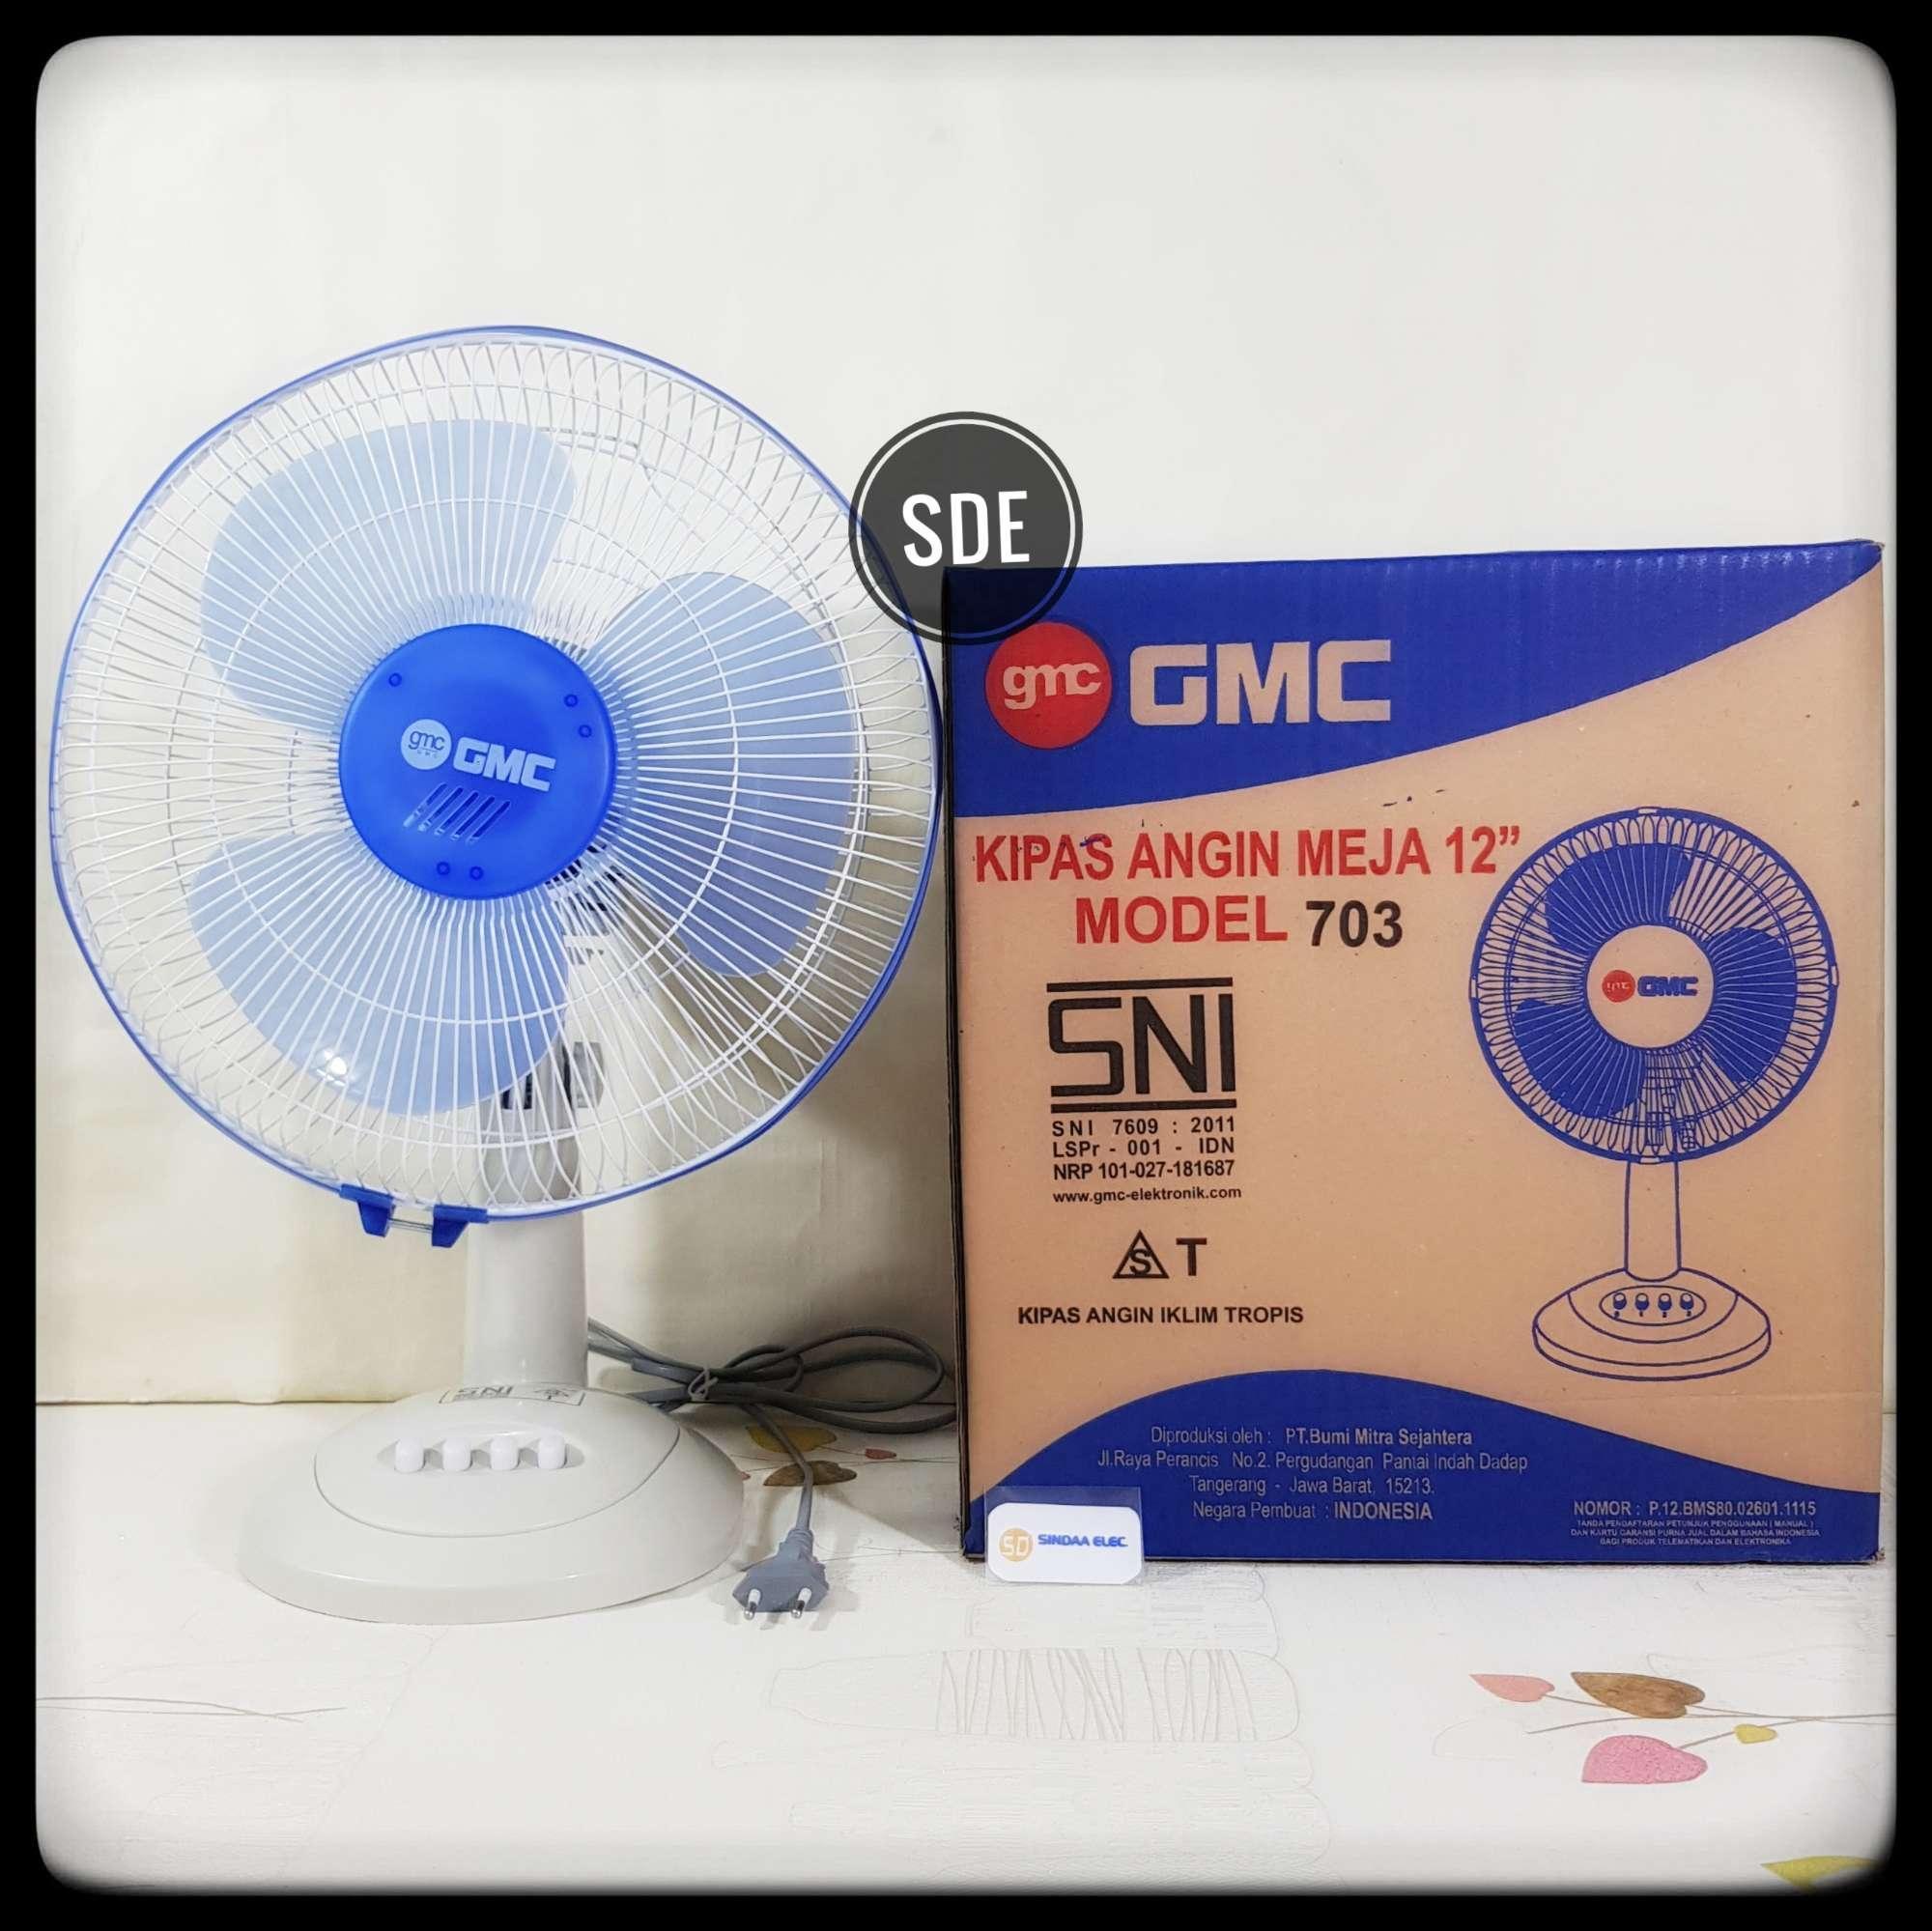 kipas angin meja gmc 703 12 inchdesk fan gmc 703kipas angin desk fan gmc